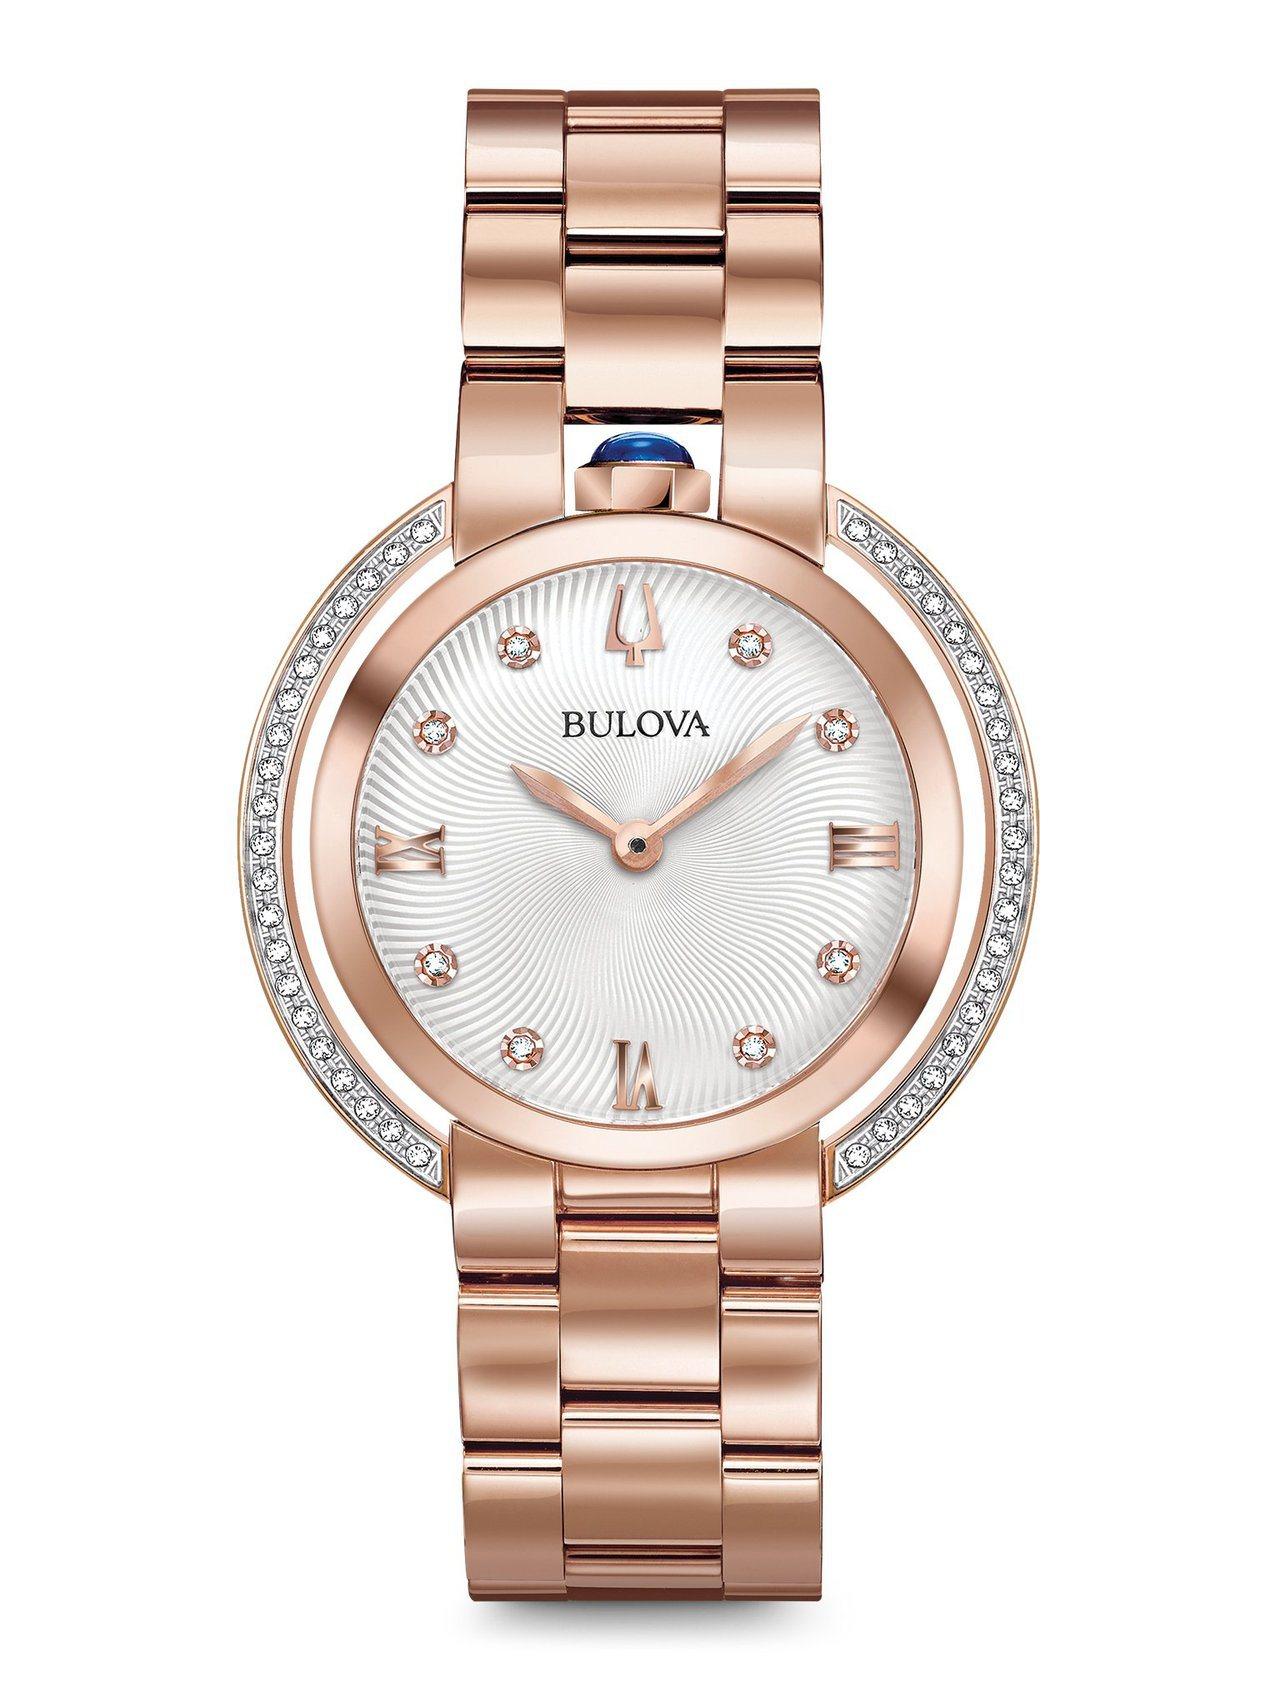 BULOVA Curv系列98R248腕表,不鏽鋼鍍玫瑰金表殼,約32,800元...